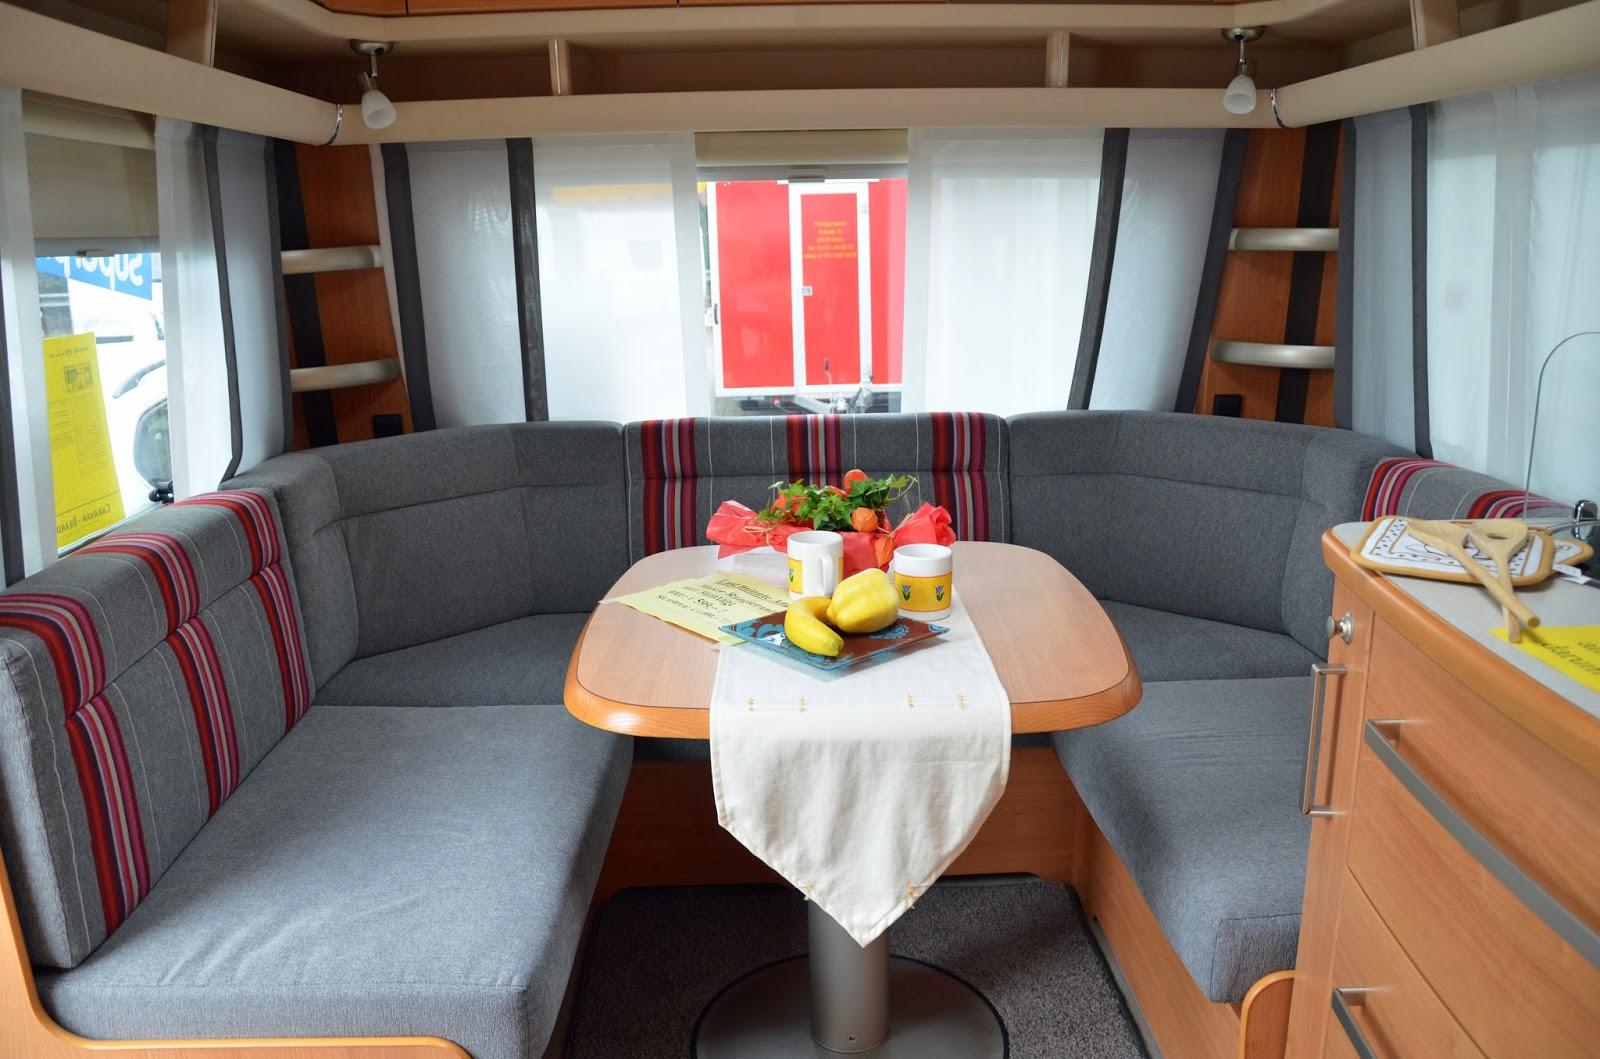 wohnwagen innen neu gestalten hauseingang geschlossener. Black Bedroom Furniture Sets. Home Design Ideas